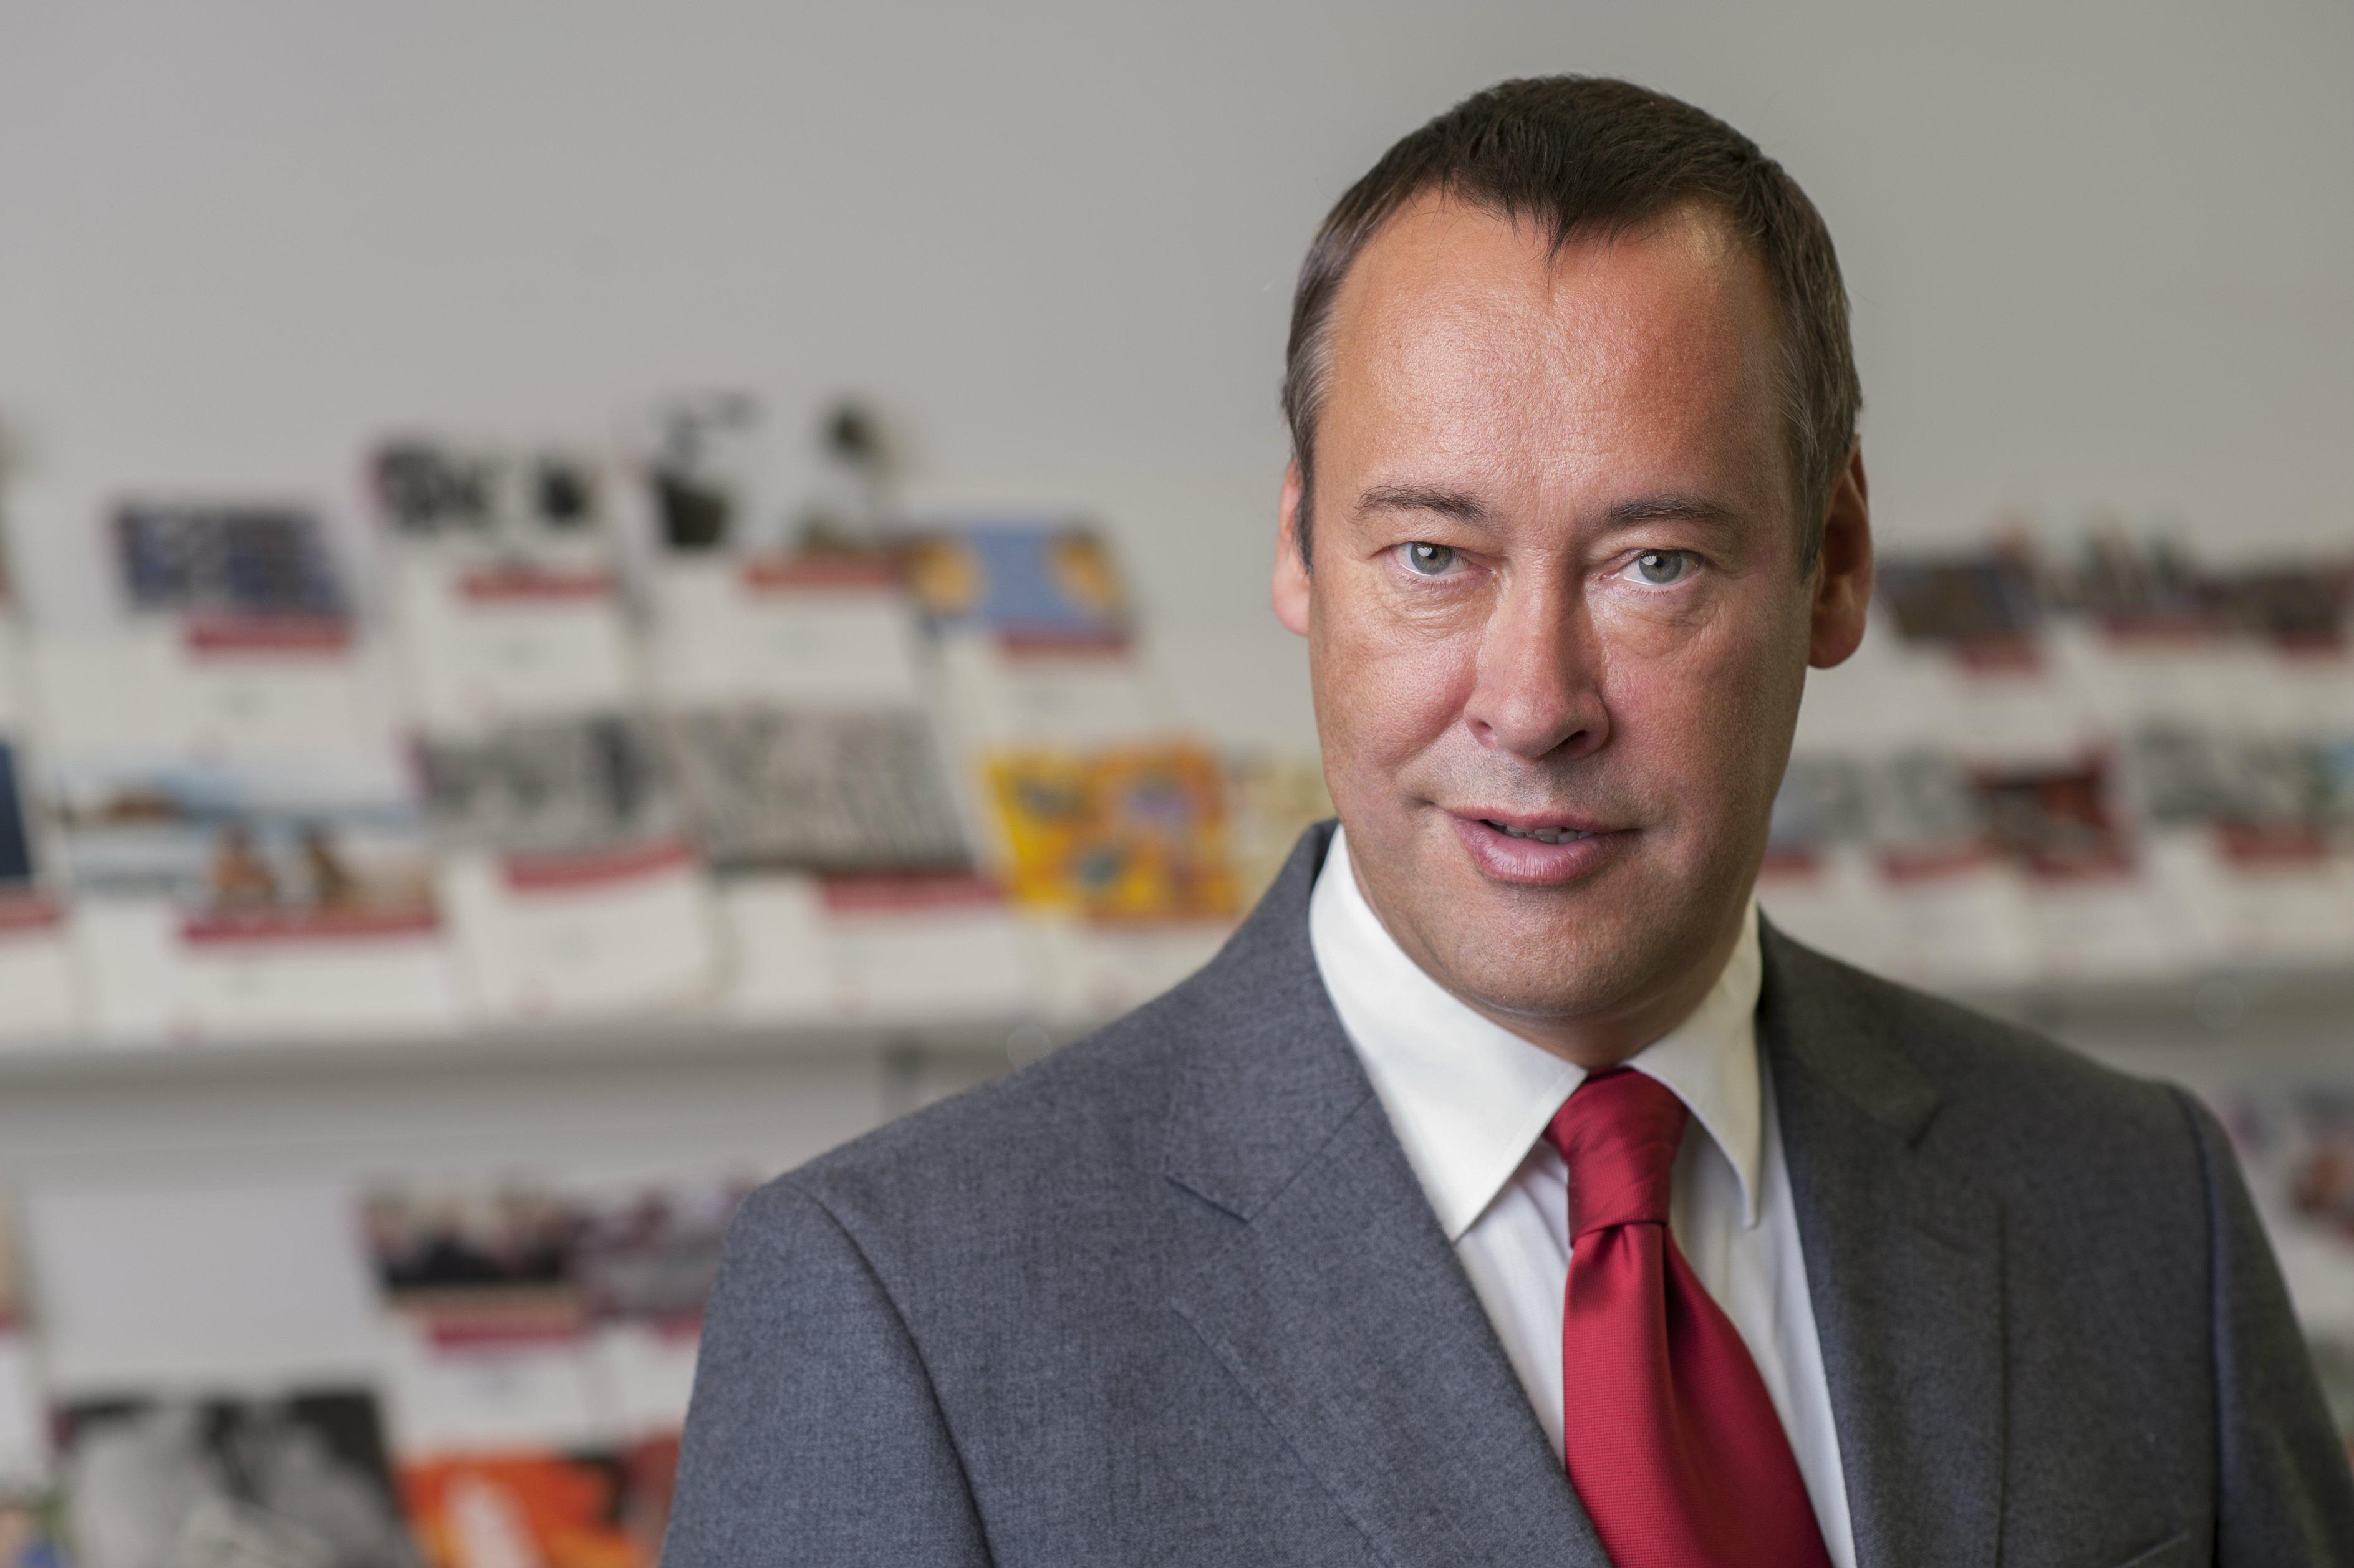 Thomas Krüger is president of the German Federal Agency for Civic Education (bpb). [bpb]